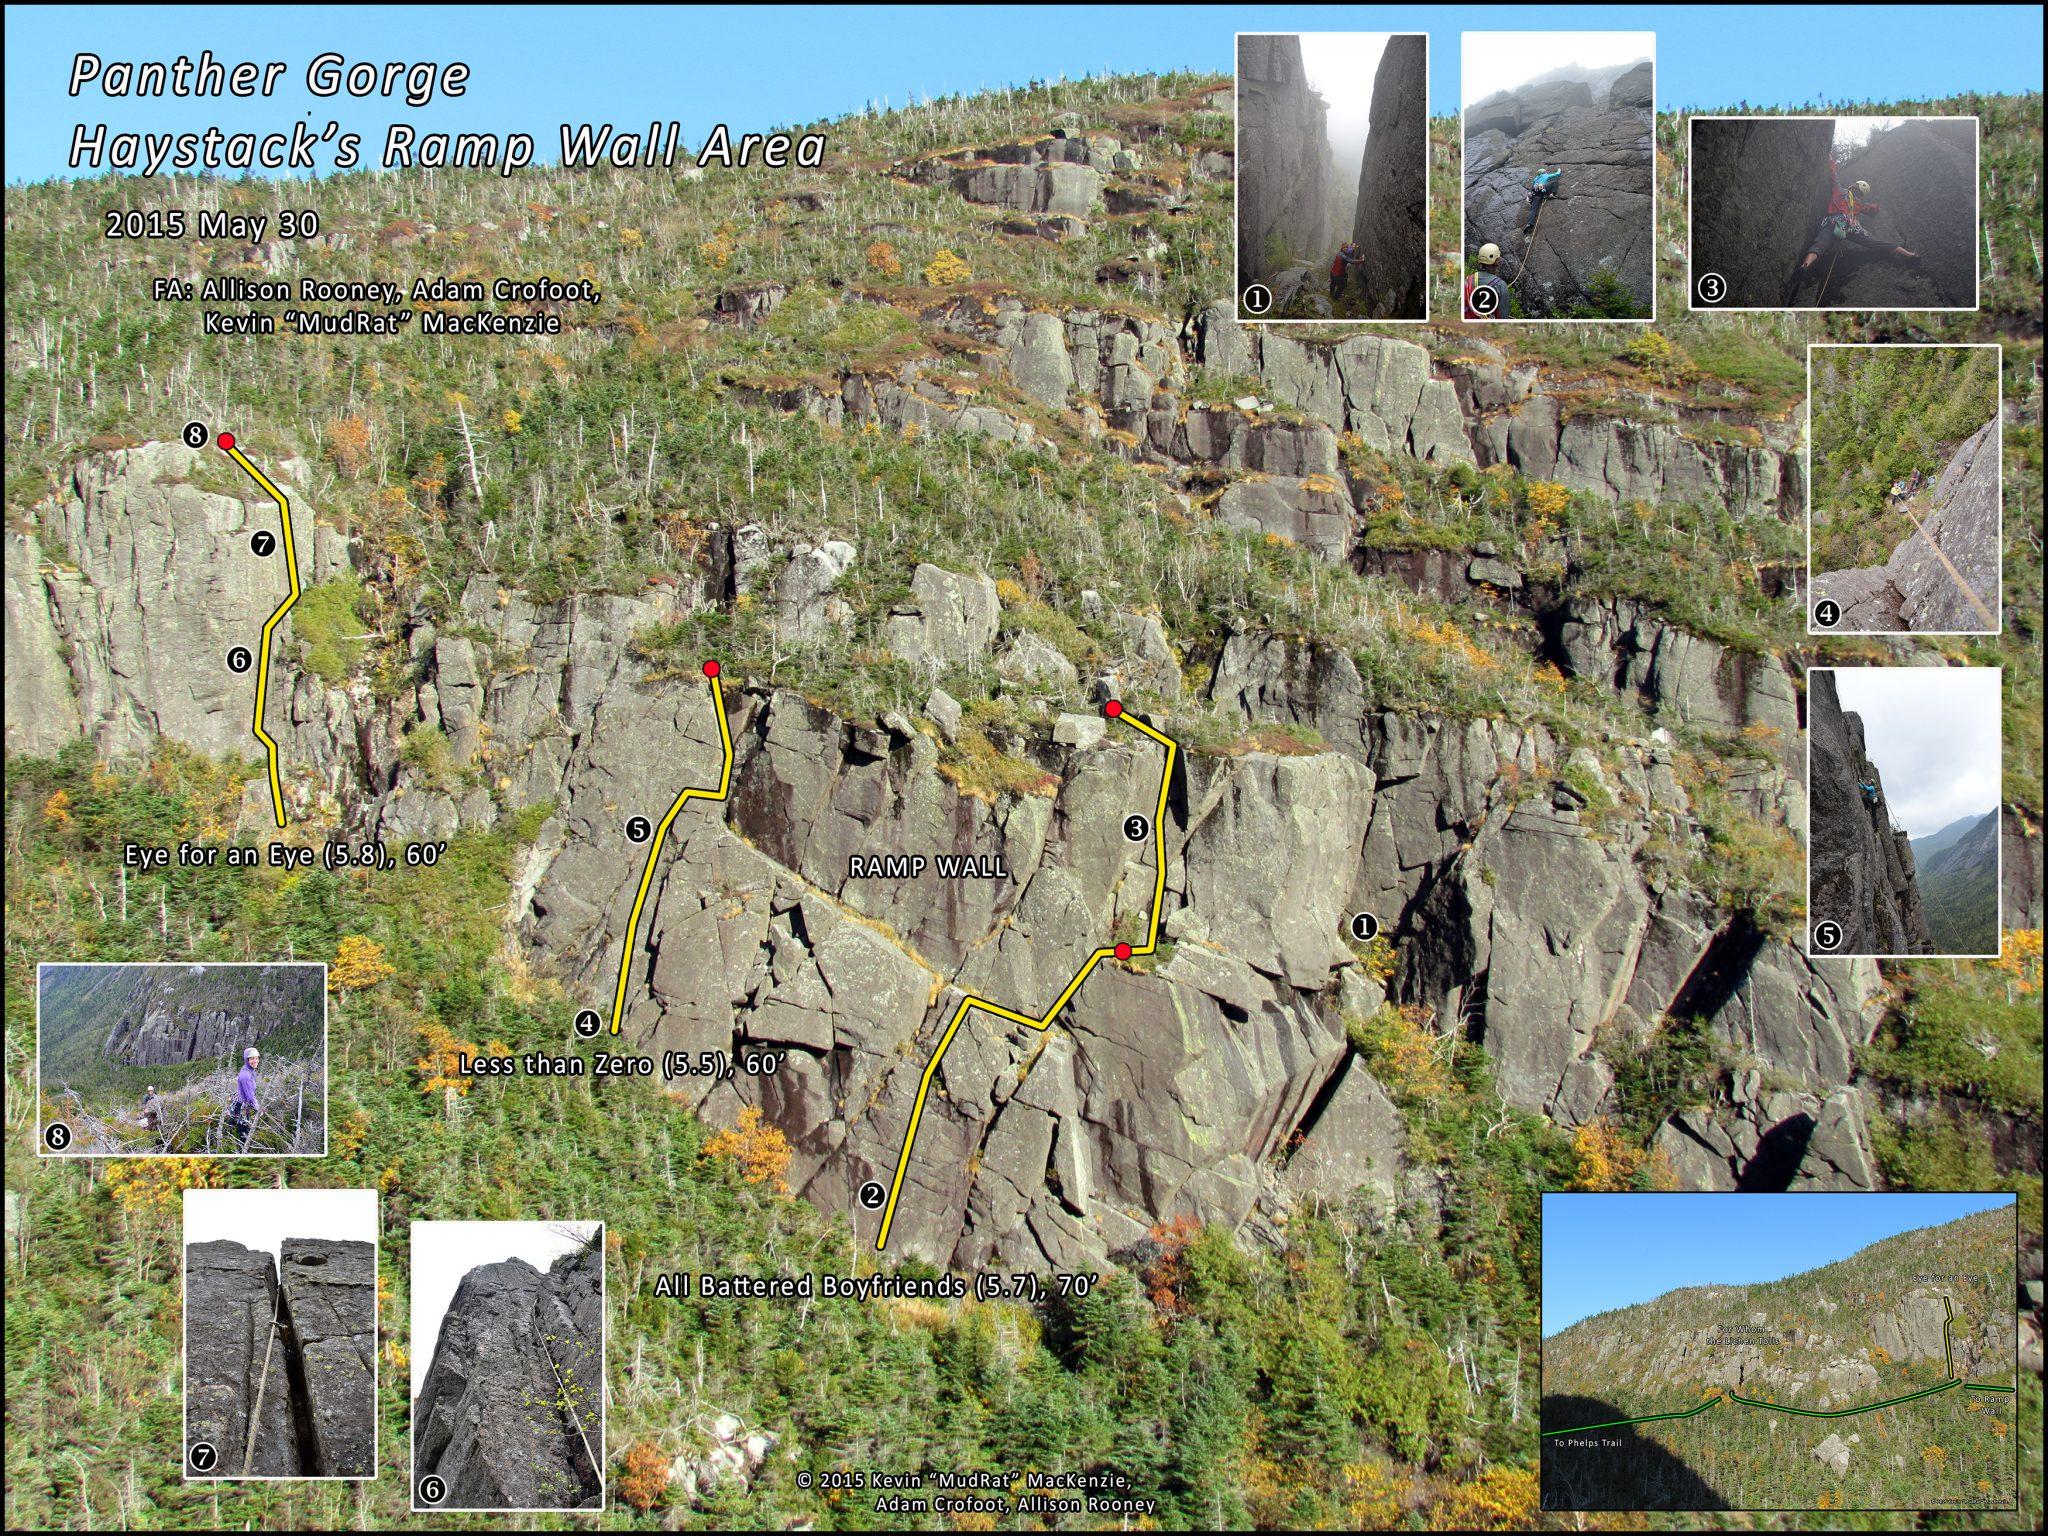 Panther Gorge Ramp Wall